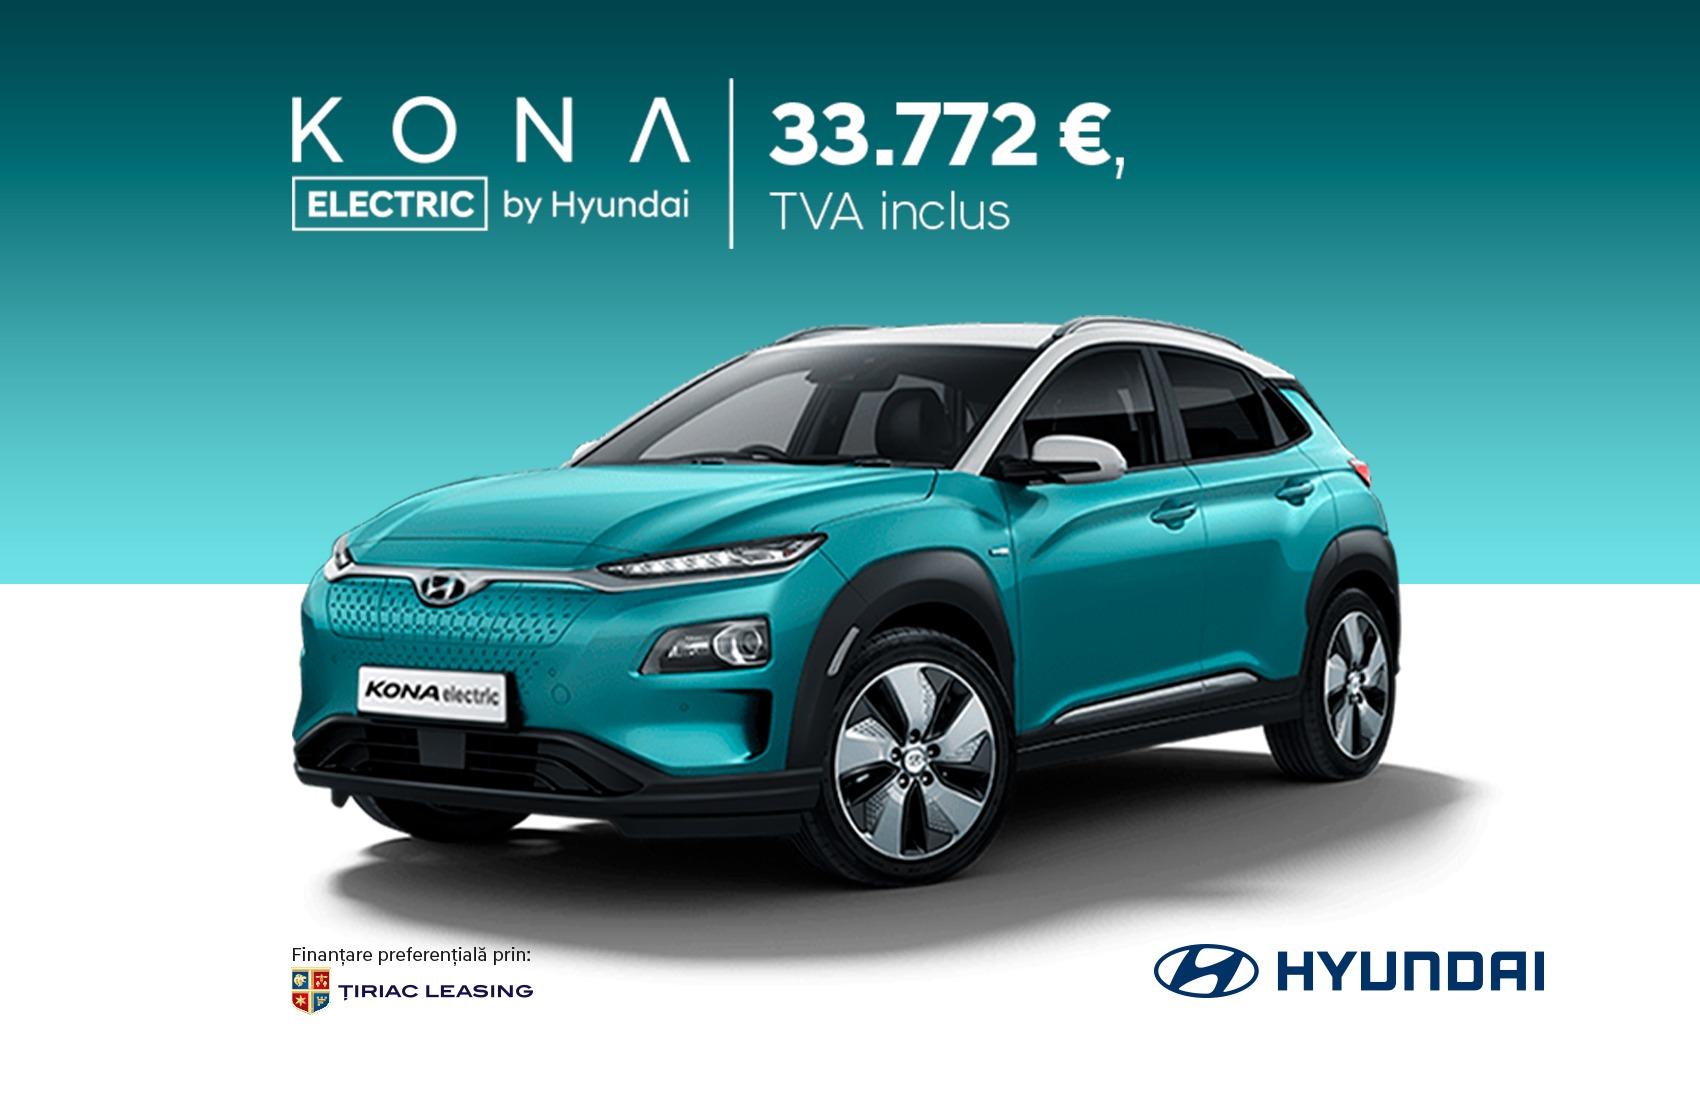 KONA ELECTRIC - 33.772 €, TVA inclus